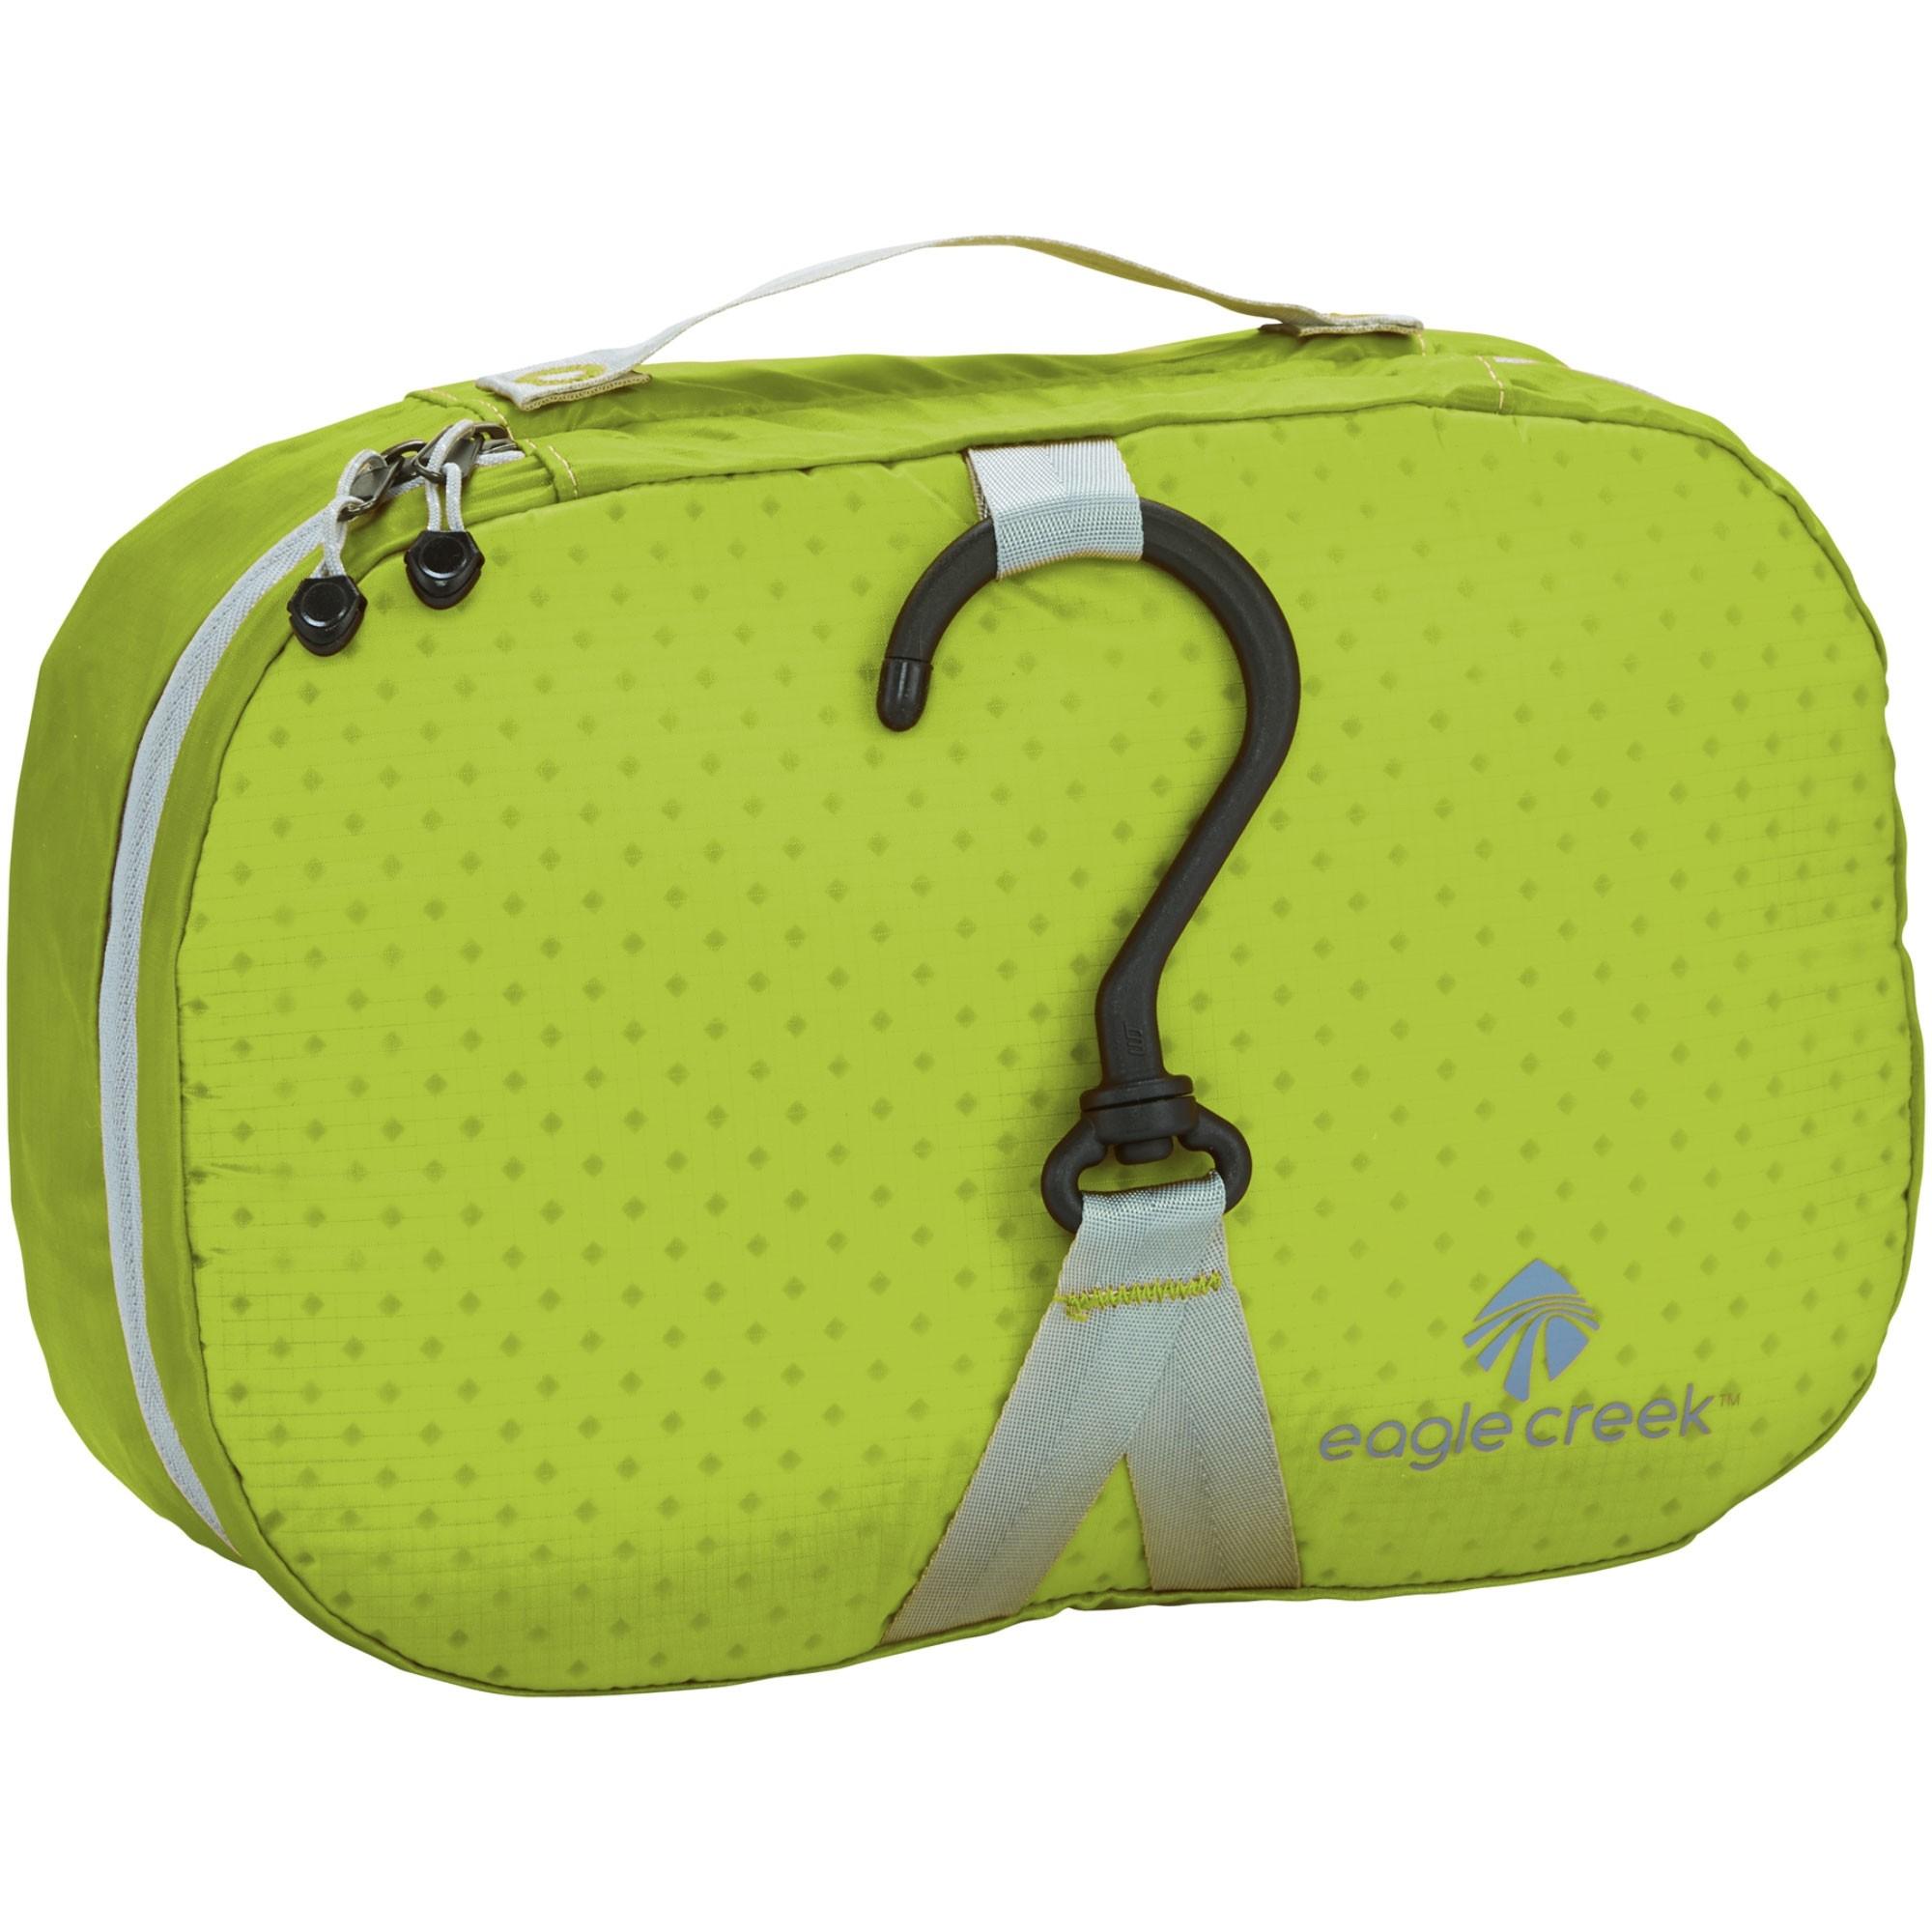 EAGLE CREEK - Specter Wallaby Small Wash Bag - Strobe Green